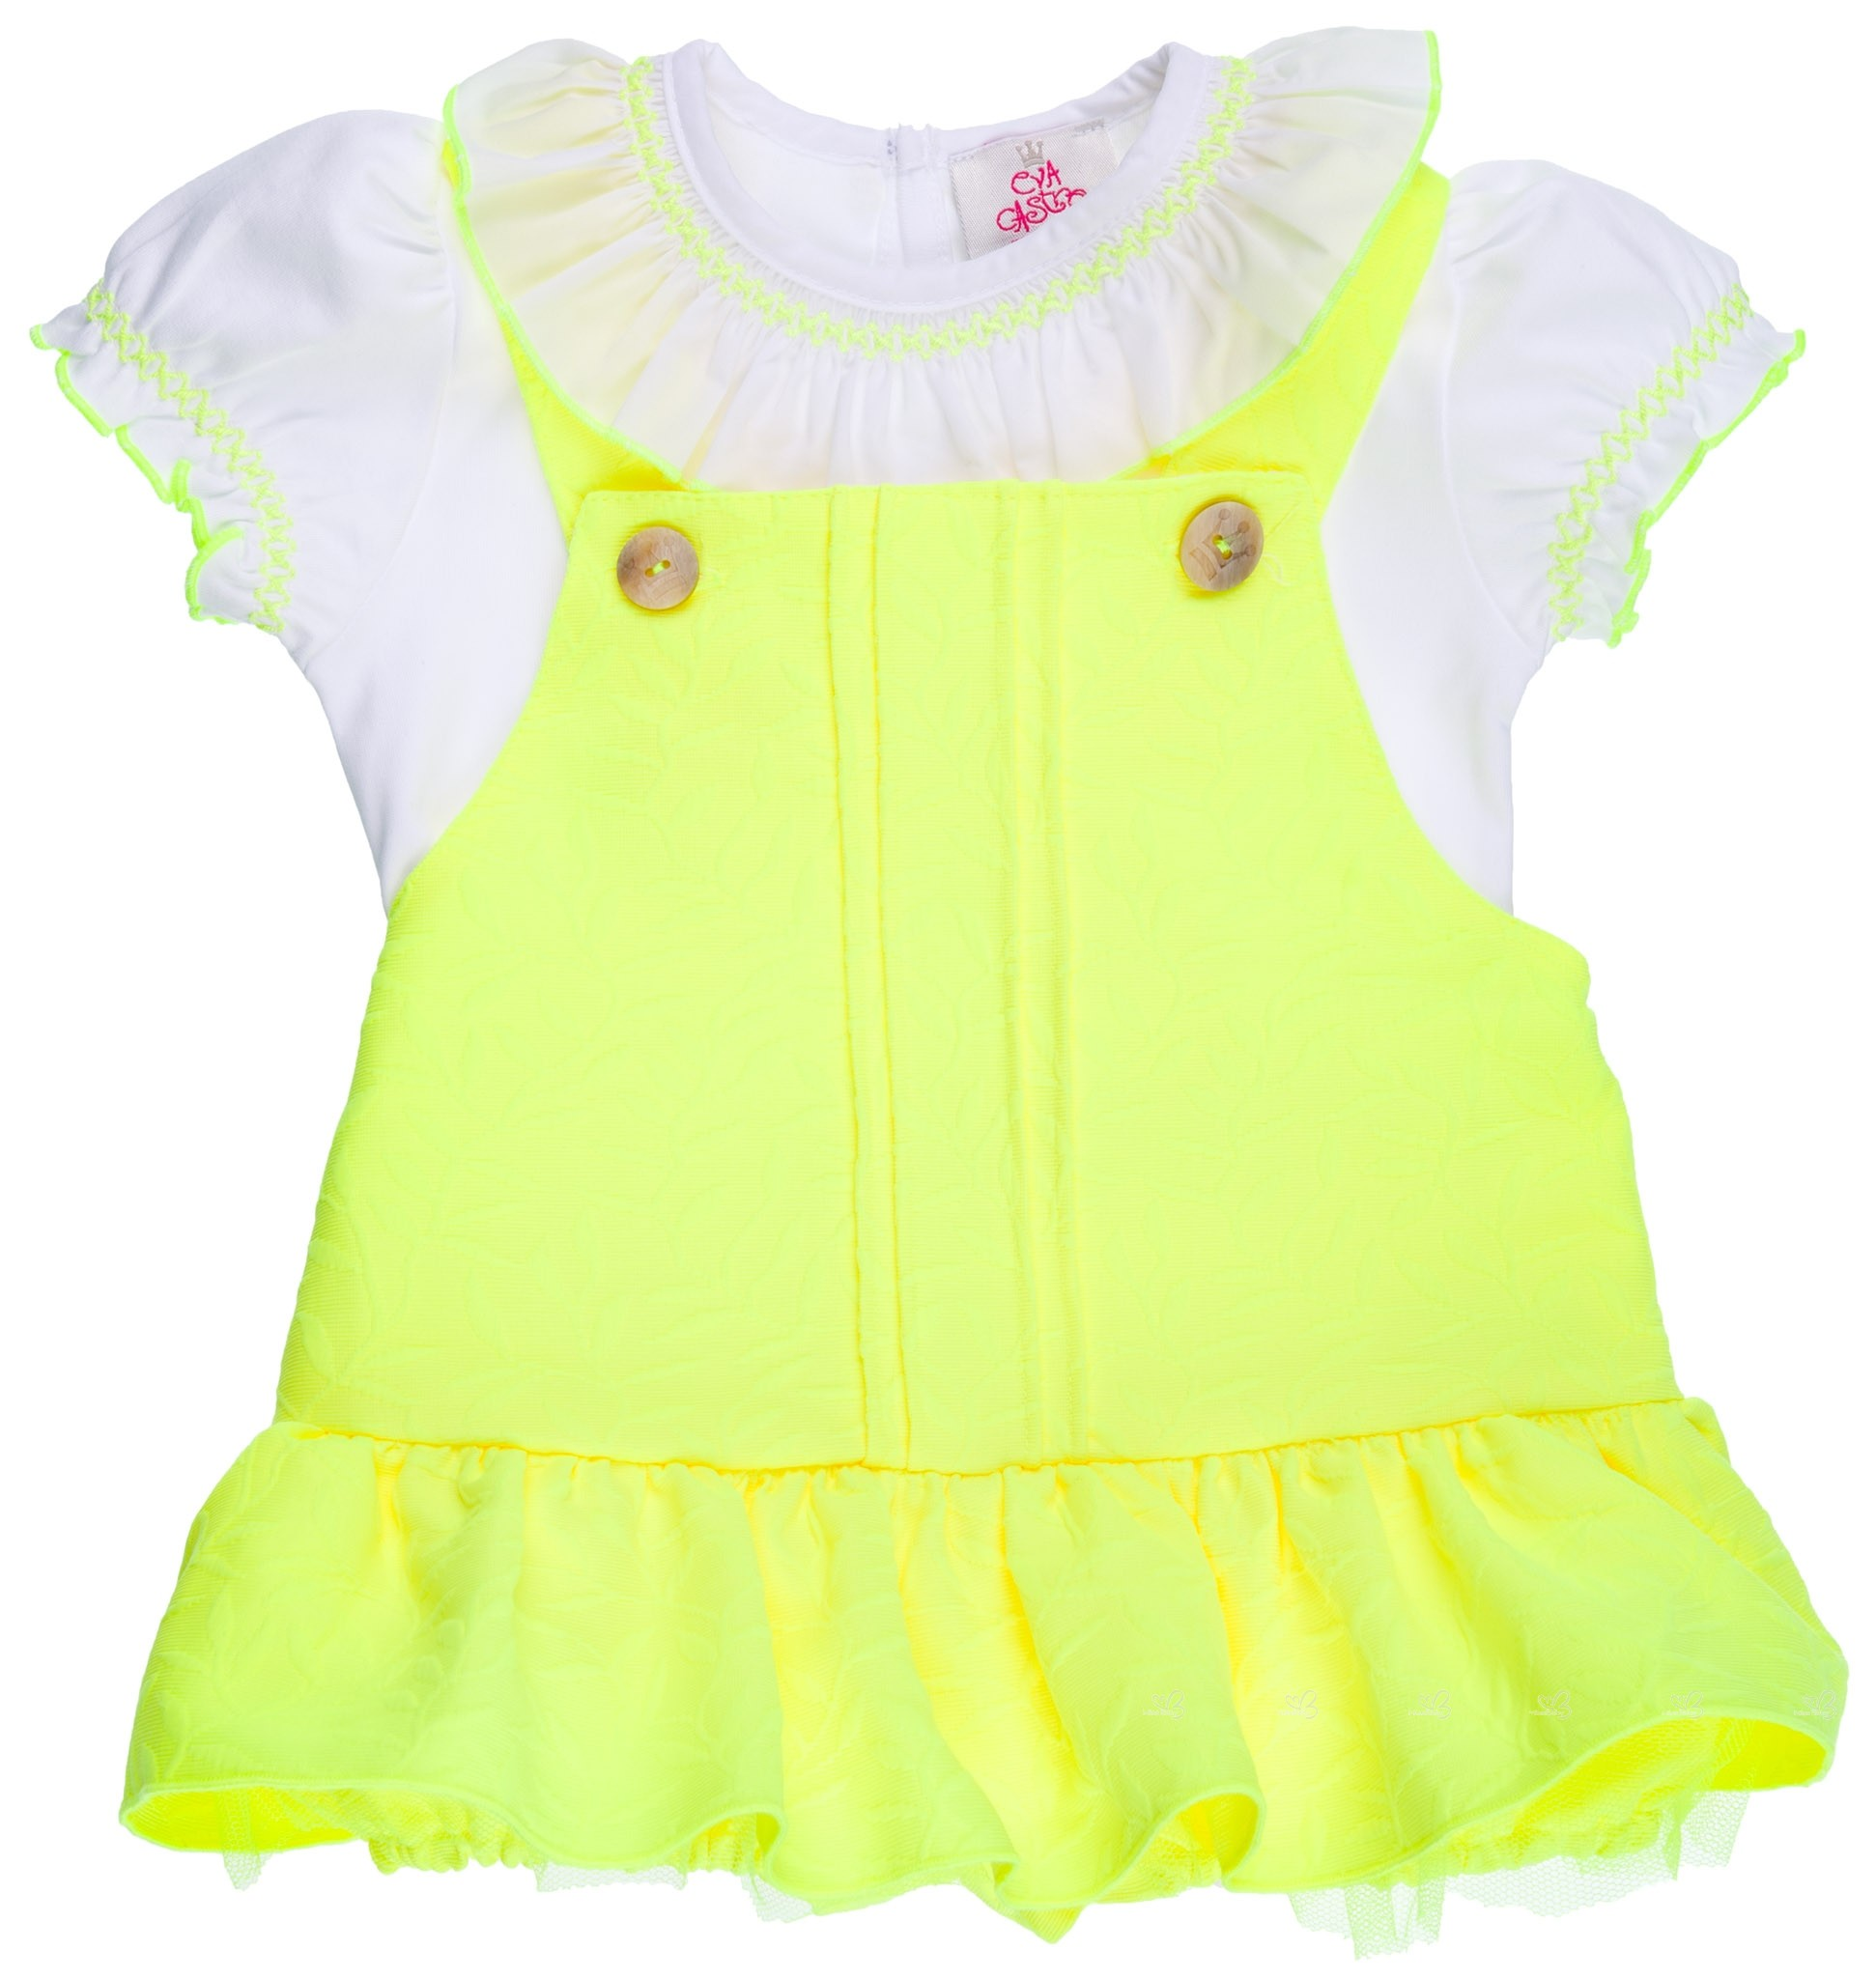 ccfaa29ab Conjunto Niña Camiseta Blanca & Ranita Volante Amarillo Flúor